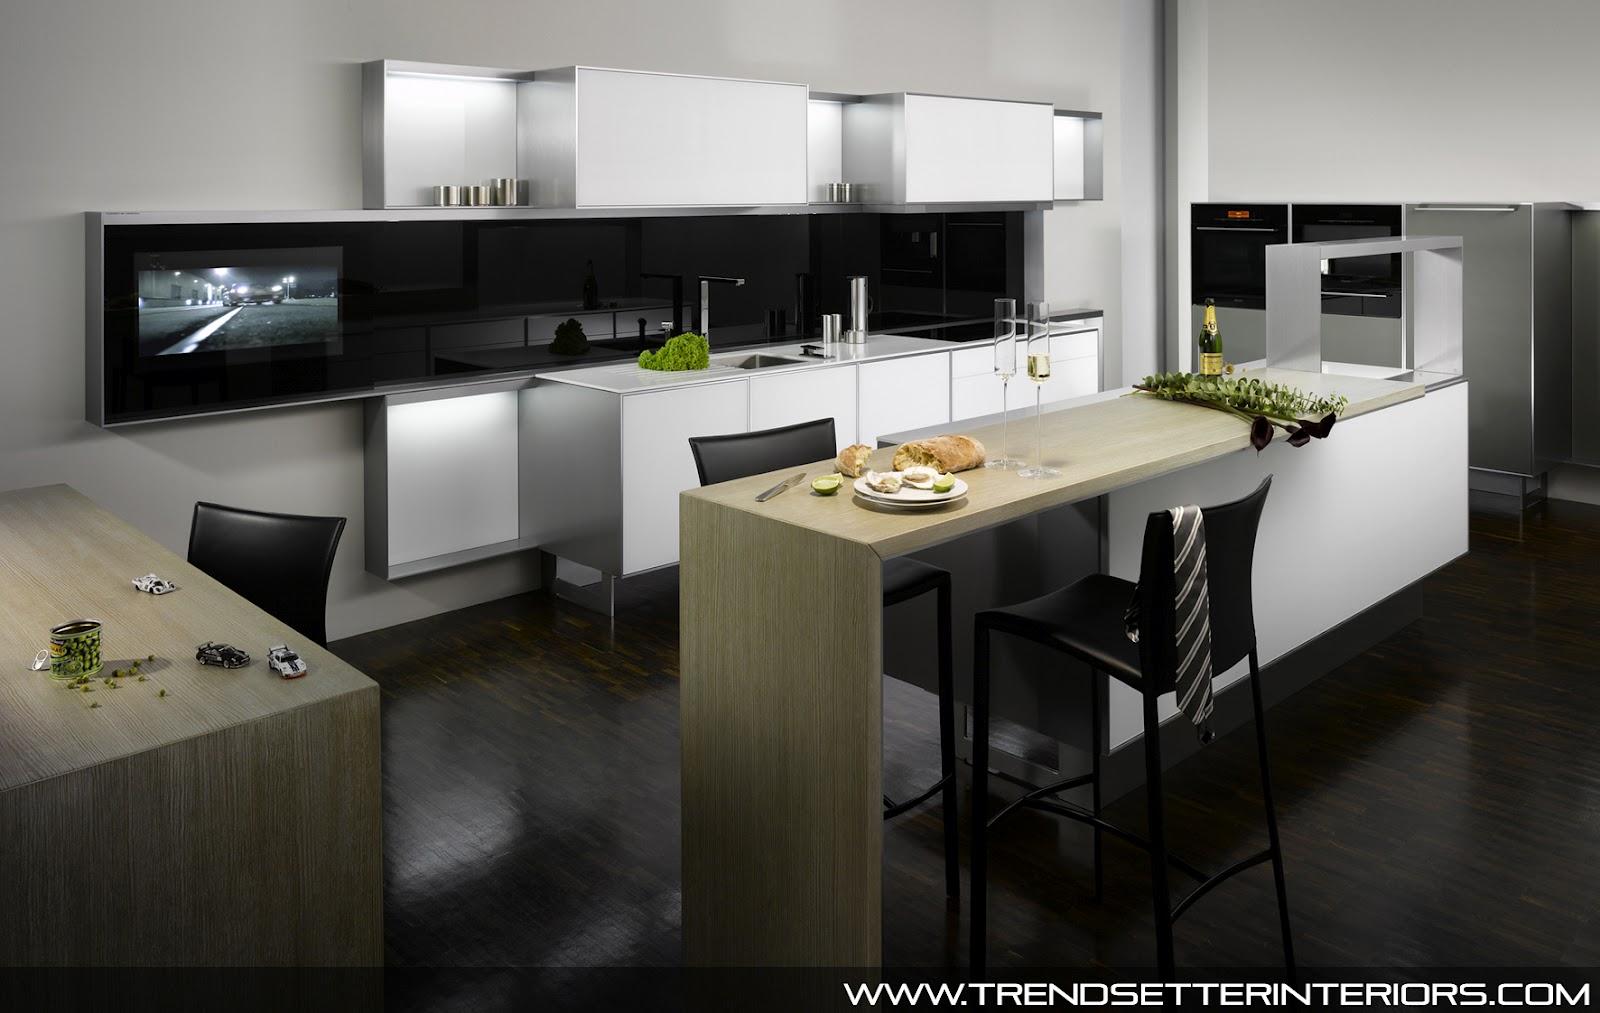 Uncategorized Porsche Design Kitchen trendsetter interiors porsche design kitchen for the ritz in paris paris